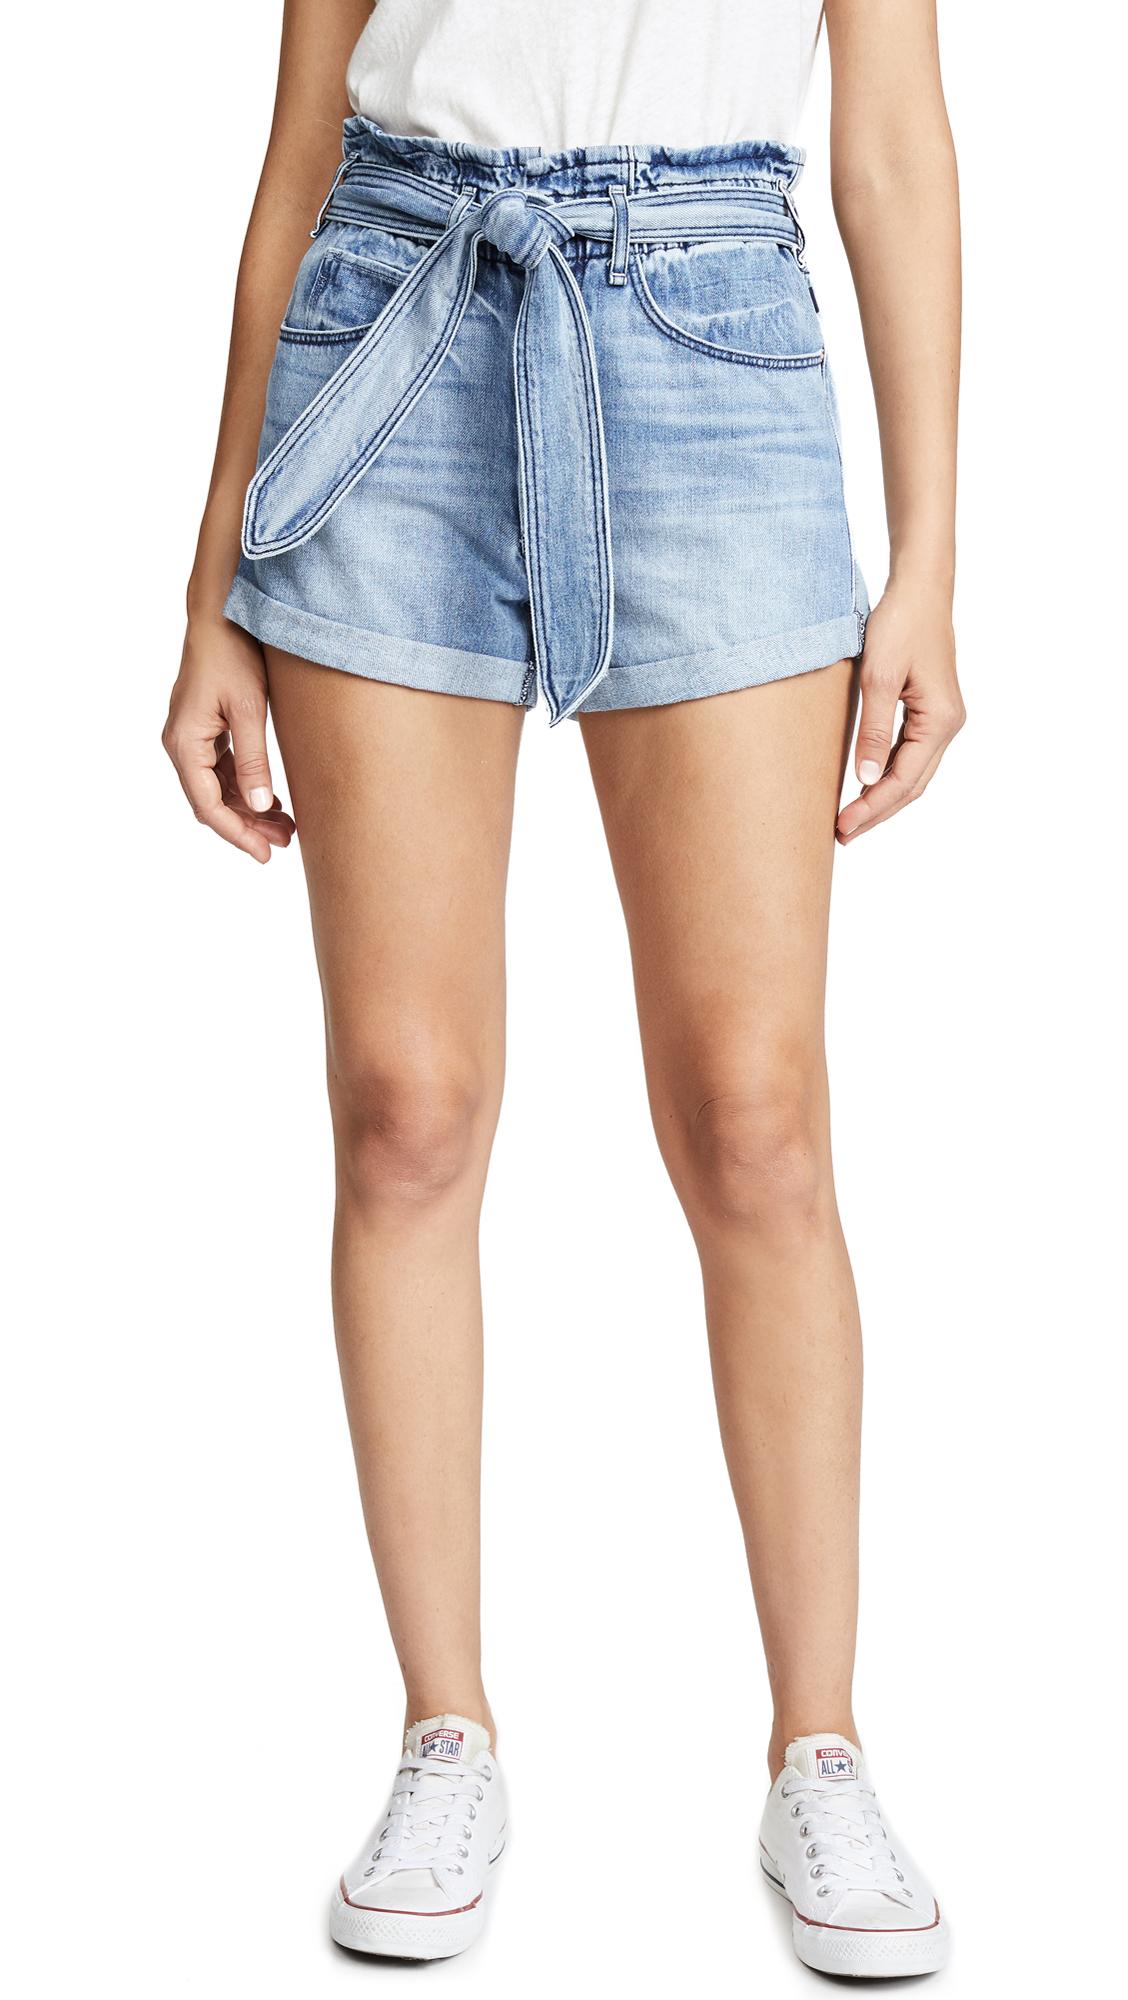 McGuire Denim Fonda Denim Shorts